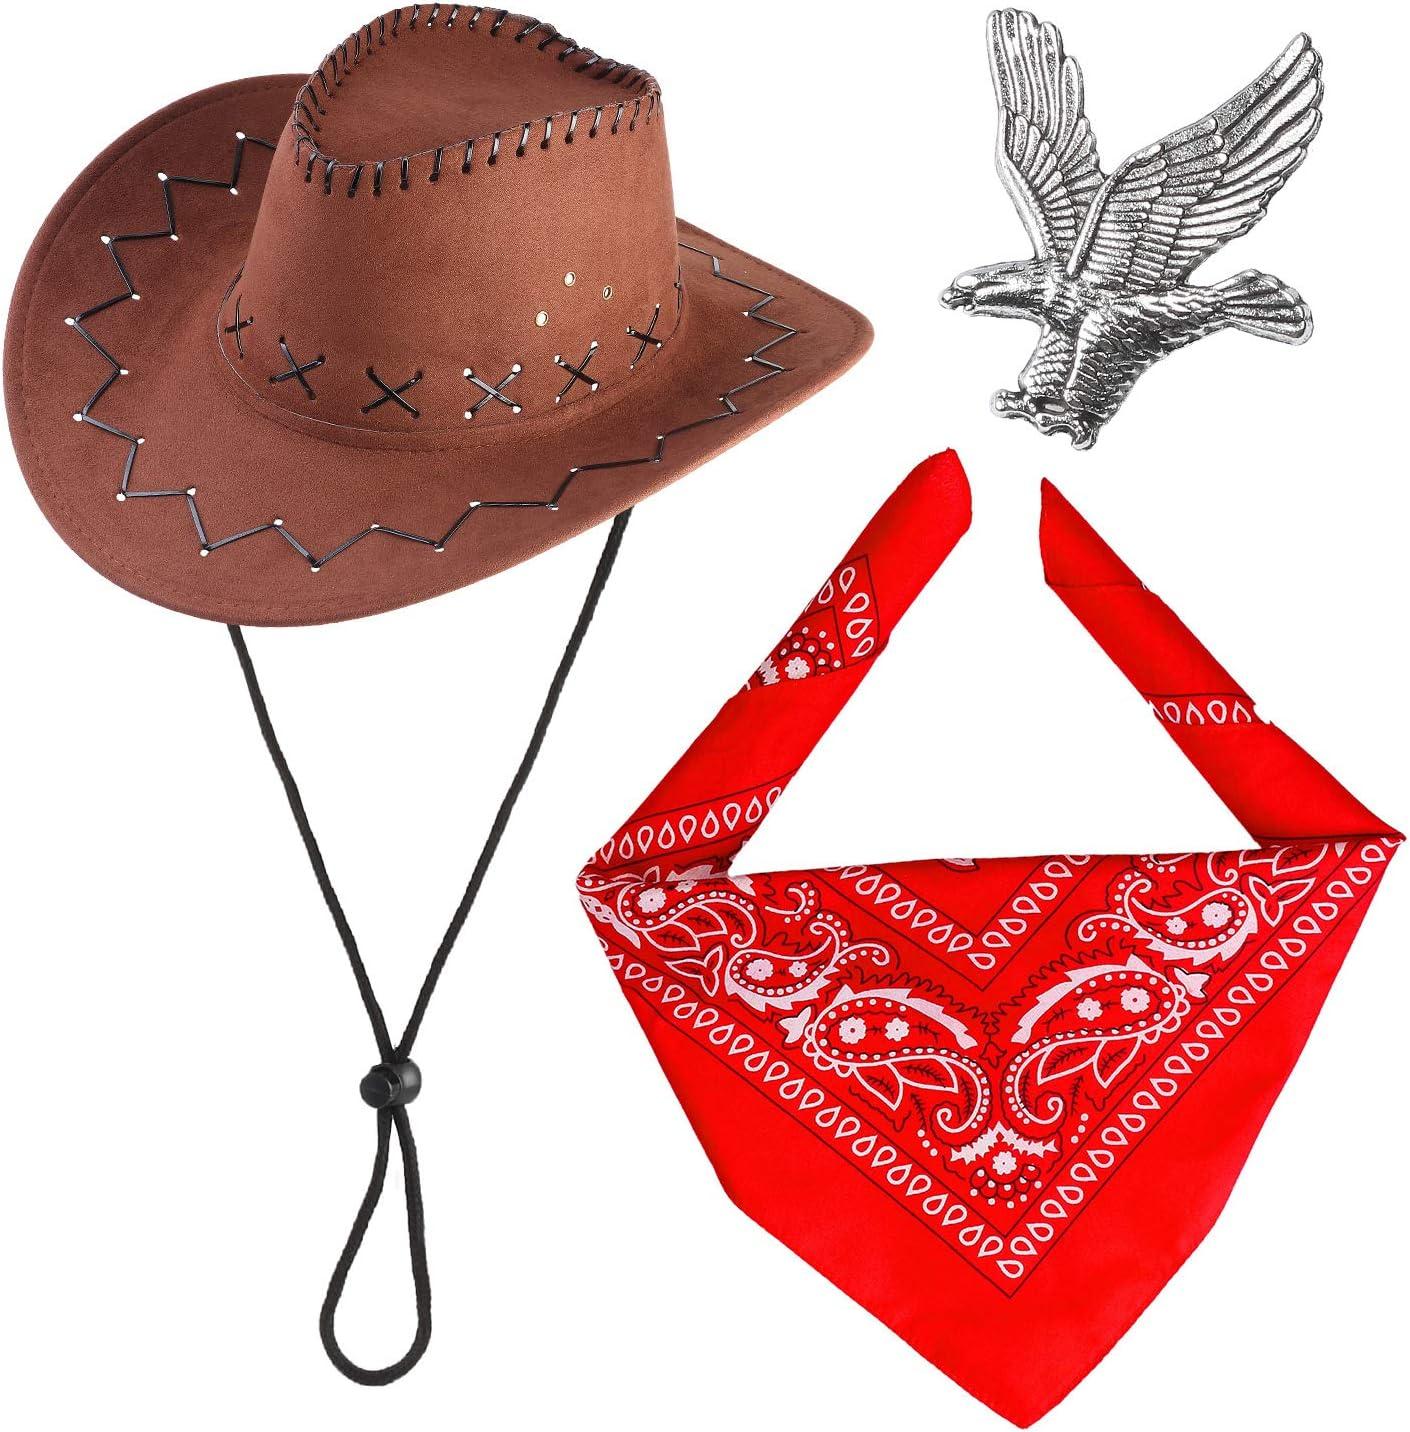 Haichen Western Cowboy Costume Accessories Set Sombrero de Vaquero Bandana Flying Eagle Pin Kit de Traje de Vaquero para la Fiesta de Halloween Dress Up (Marrón)